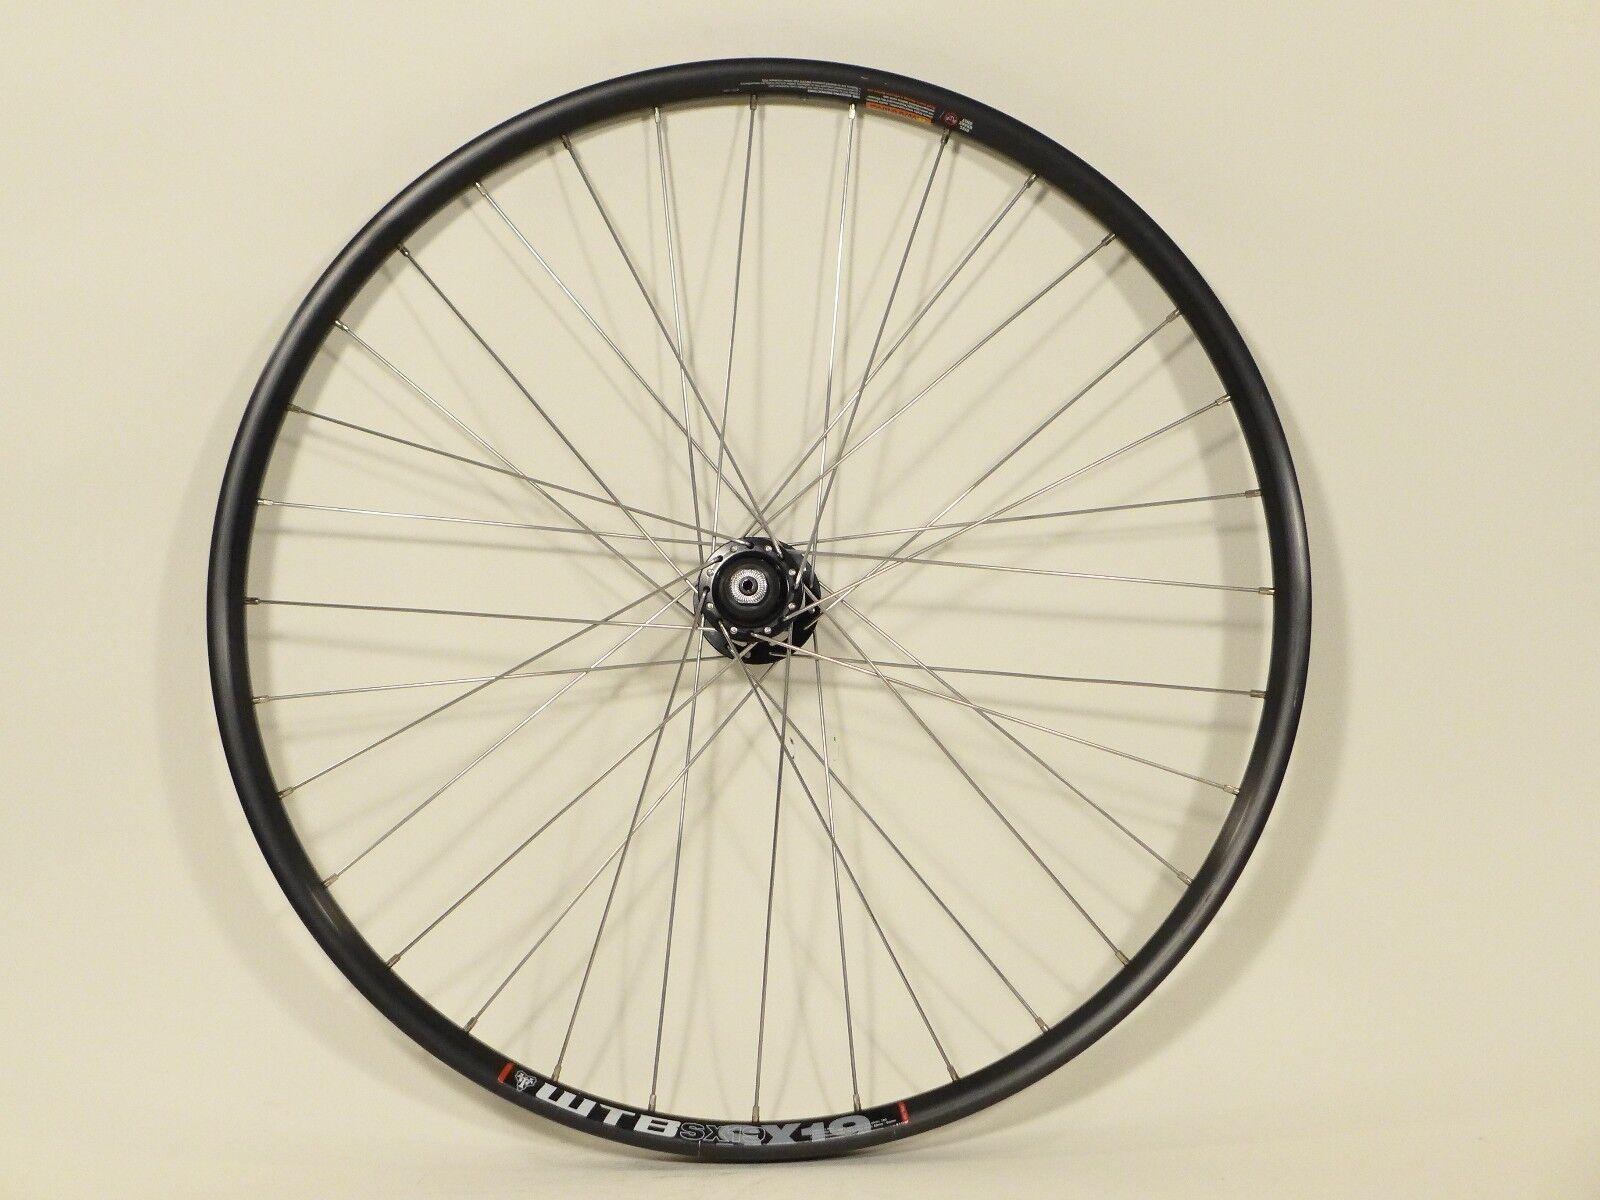 Front Wheel 26  Disc WTB SX19 Rim, Sram MTN 506 Hub 100mm QR 32h F11